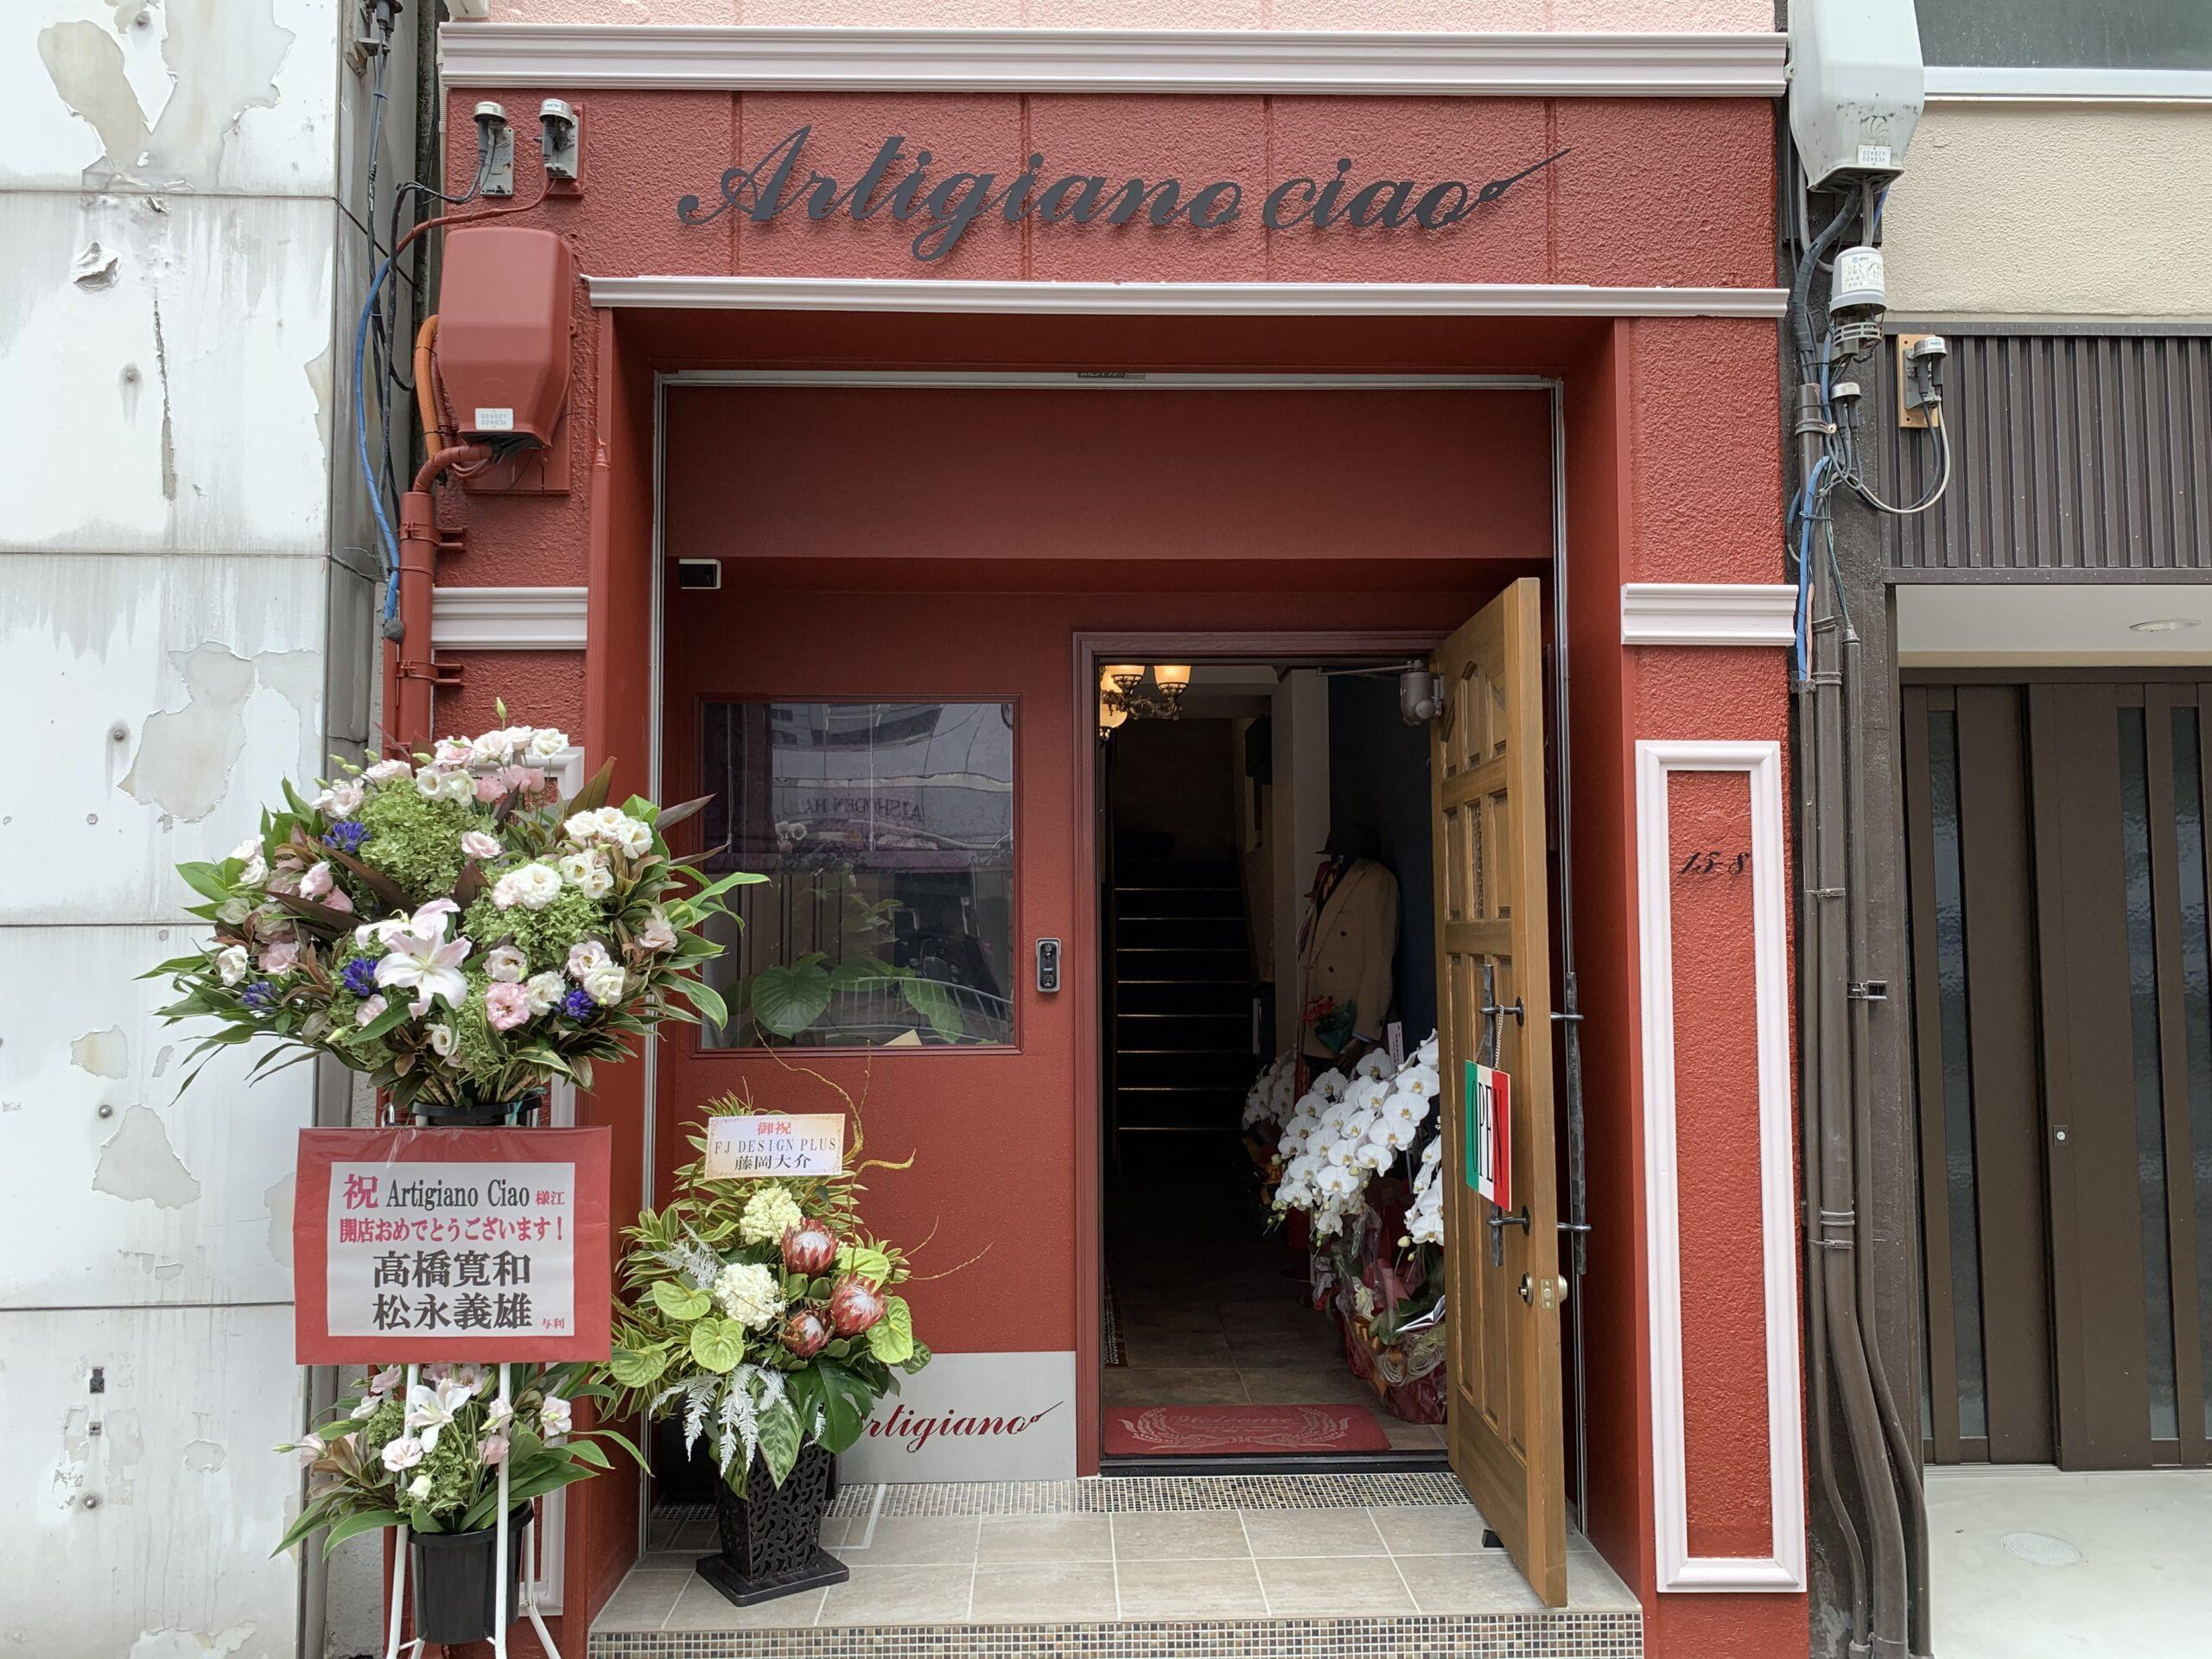 Artigiano ciao名古屋本店プレオープンしました!